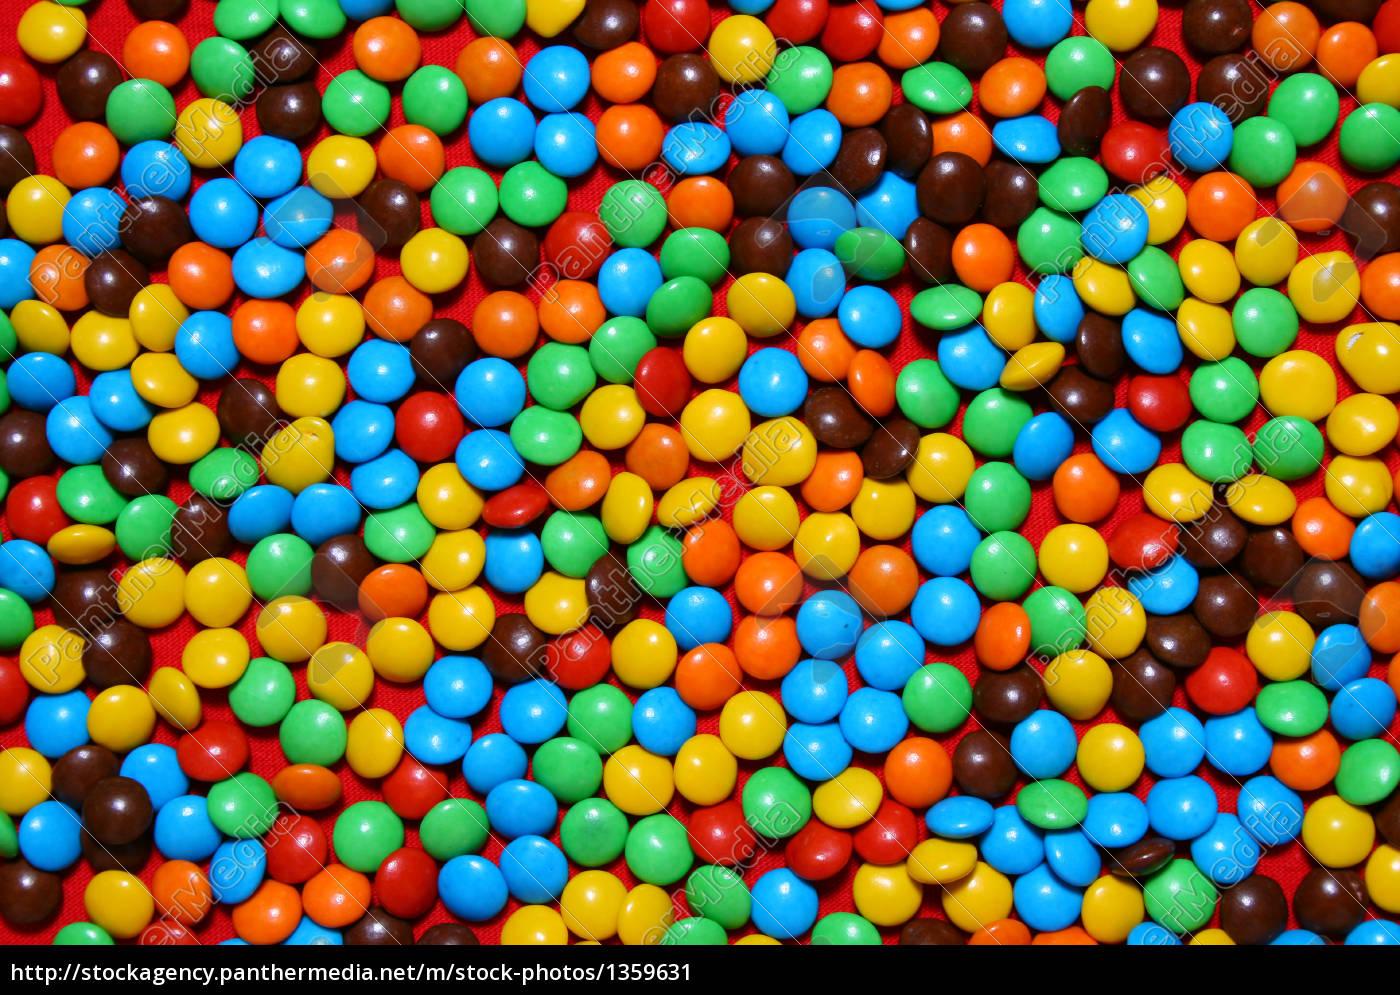 chocolate, candies, background - 1359631